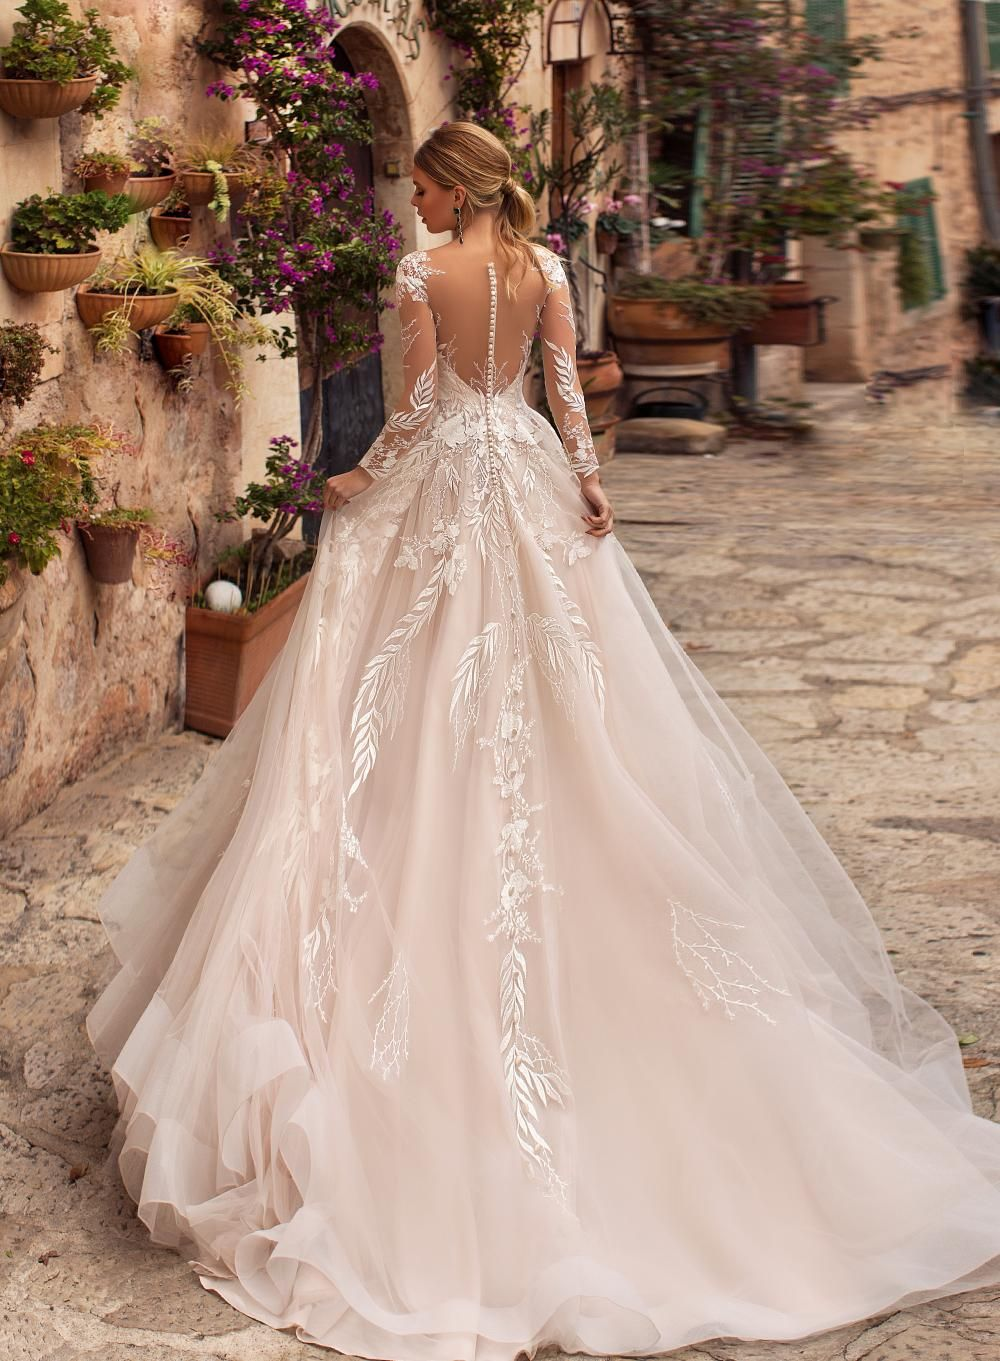 wedding dresses: 11 best pinterest wedding dressespopularity